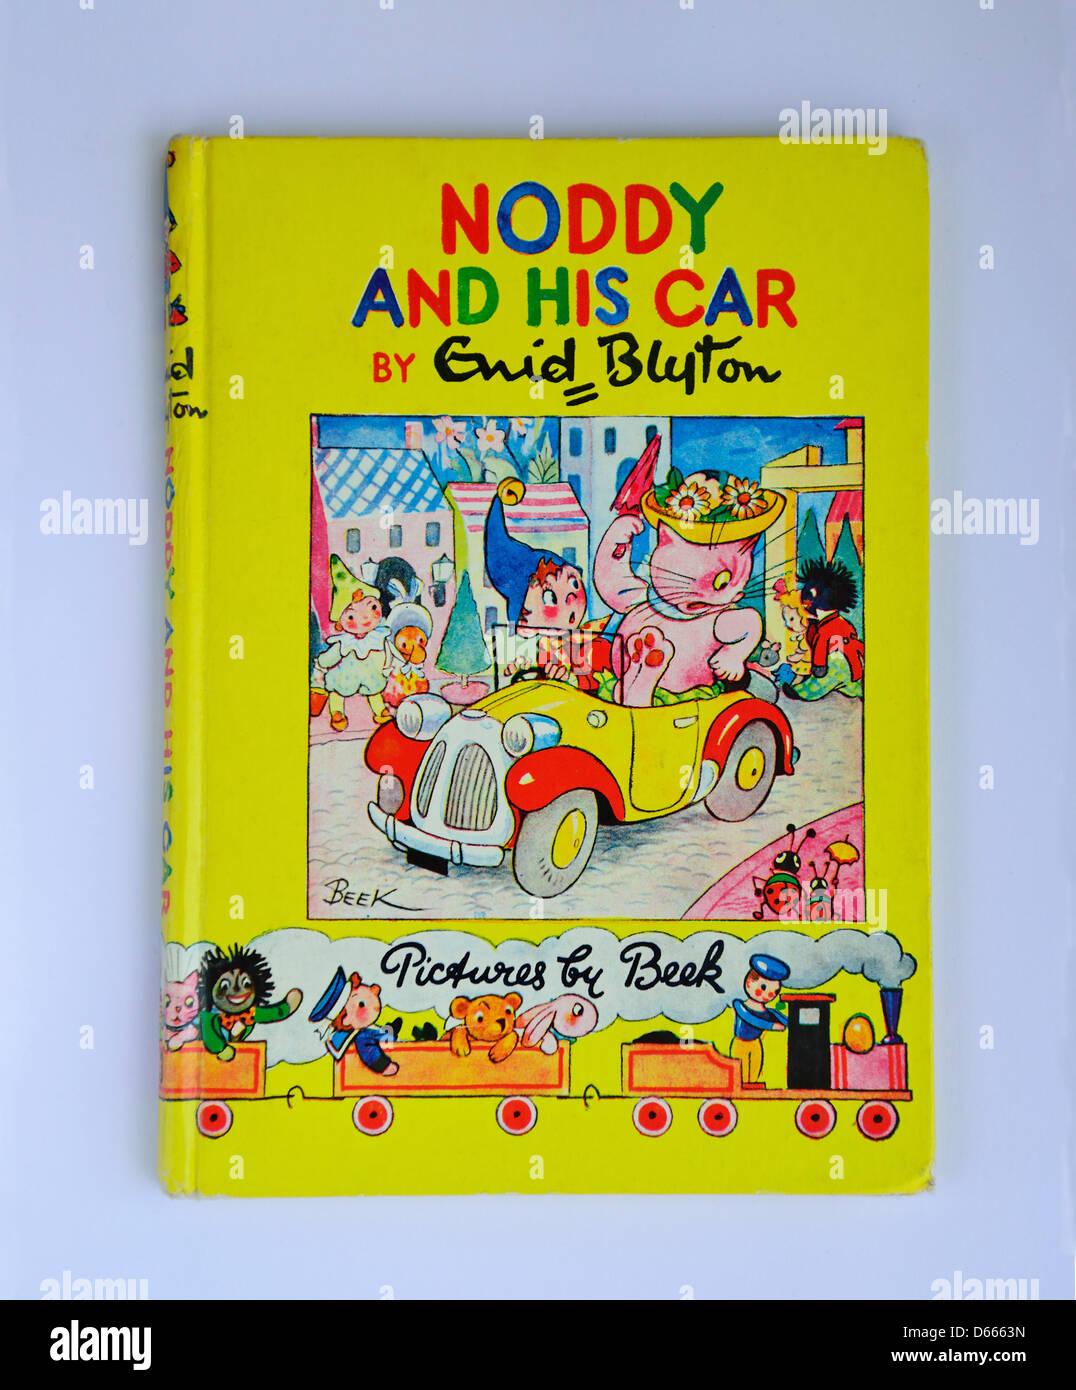 Enid Blyton's 'Noddy and his car' Noddy book, Ascot, Windsor, Berkshire, England, United Kingdom - Stock Image